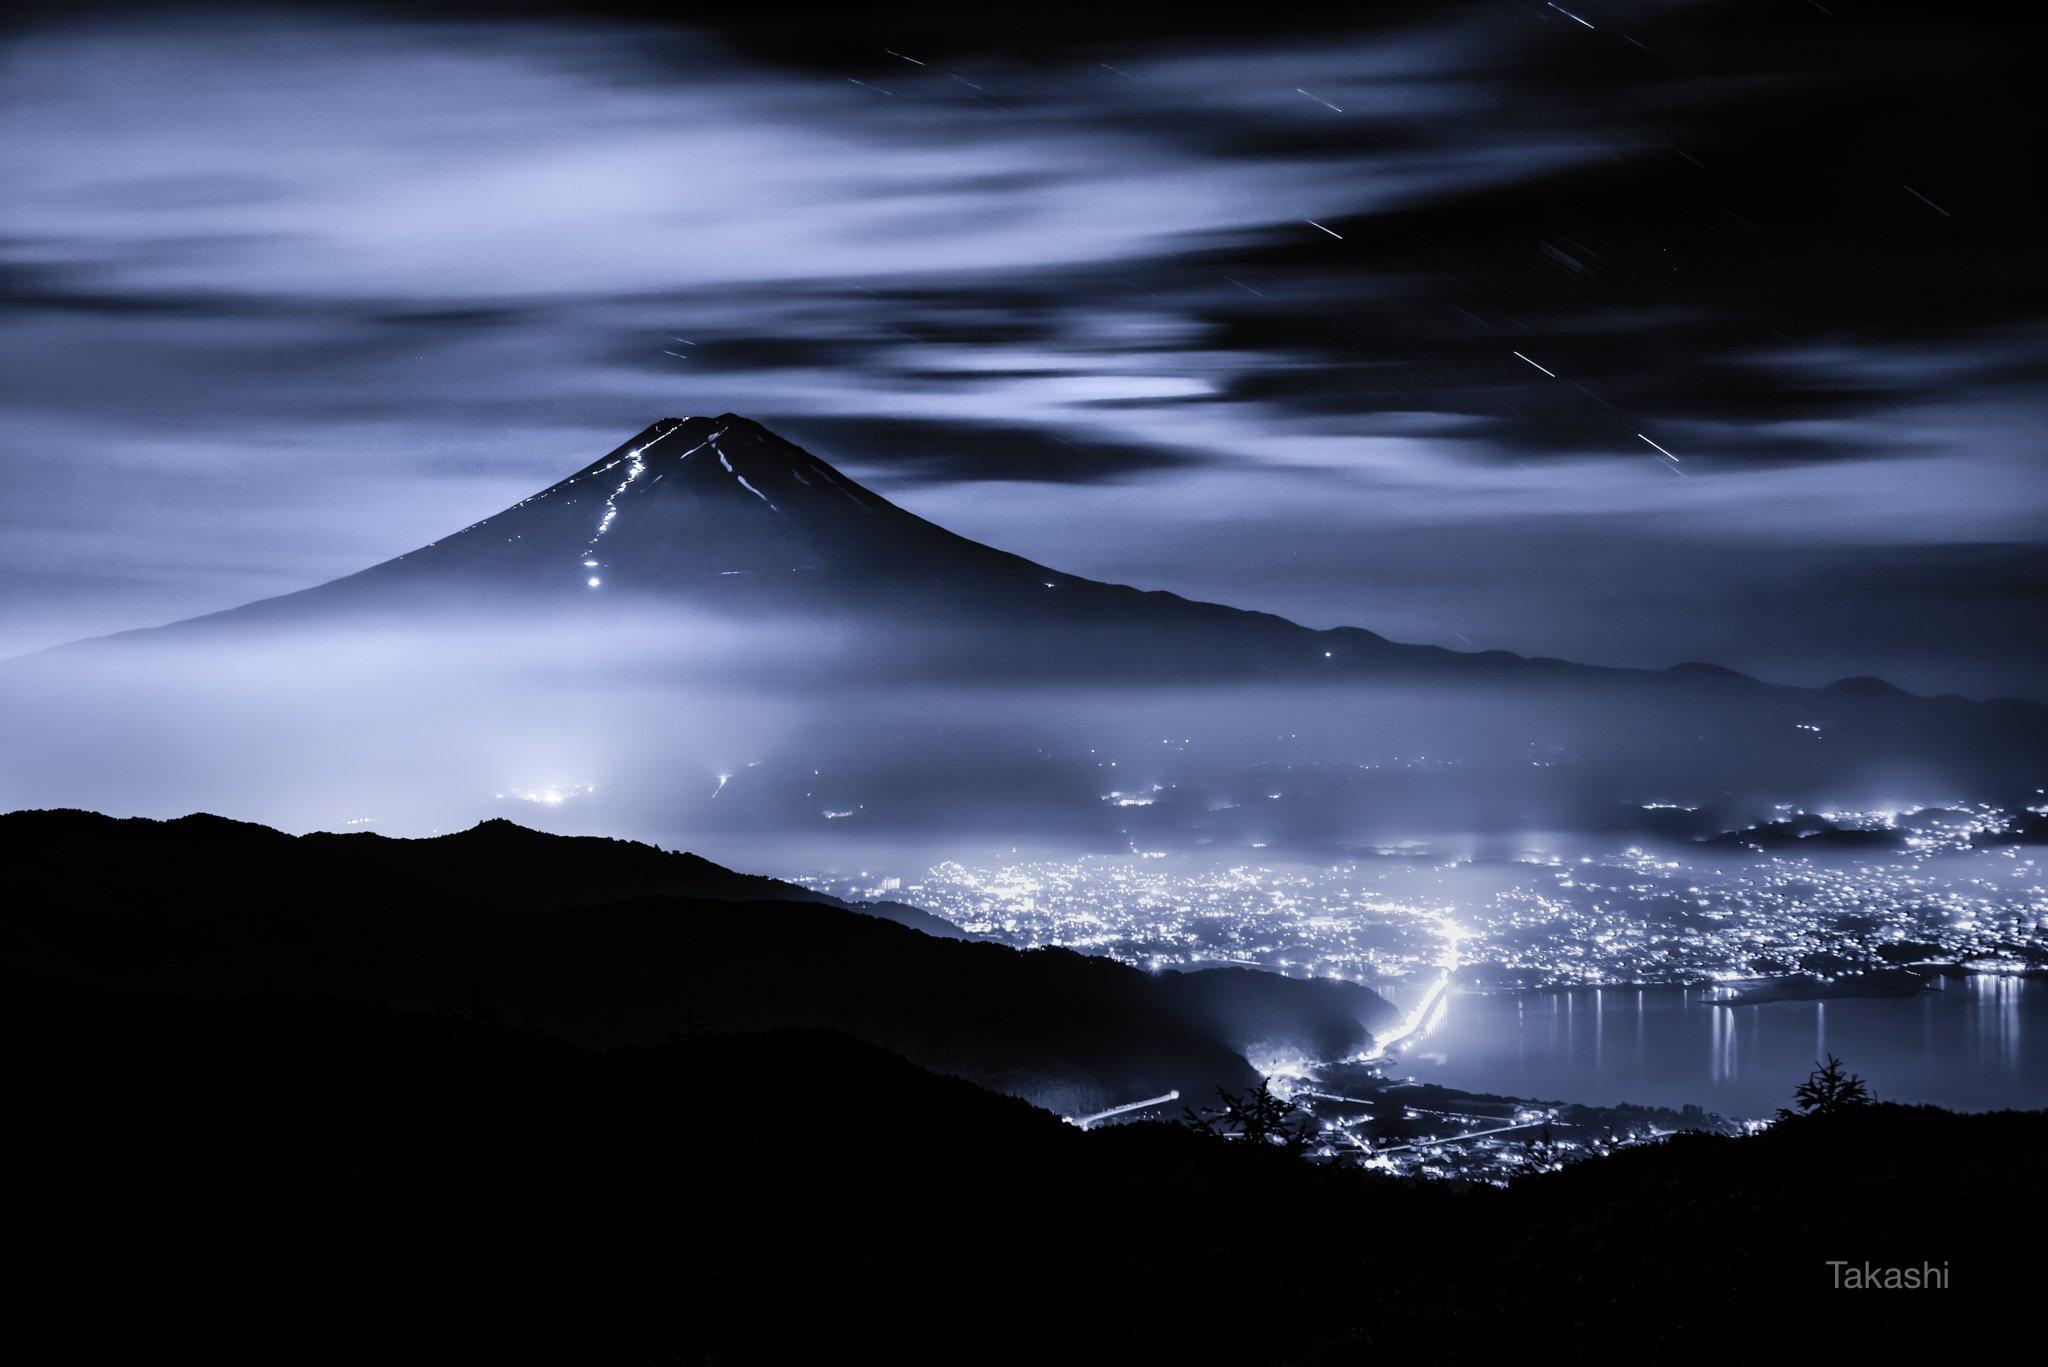 Fuji,Japan,mountain,clouds,sky,fog,lake,blue,star,night,amazing,landscape,wonderful,beautiful, Takashi